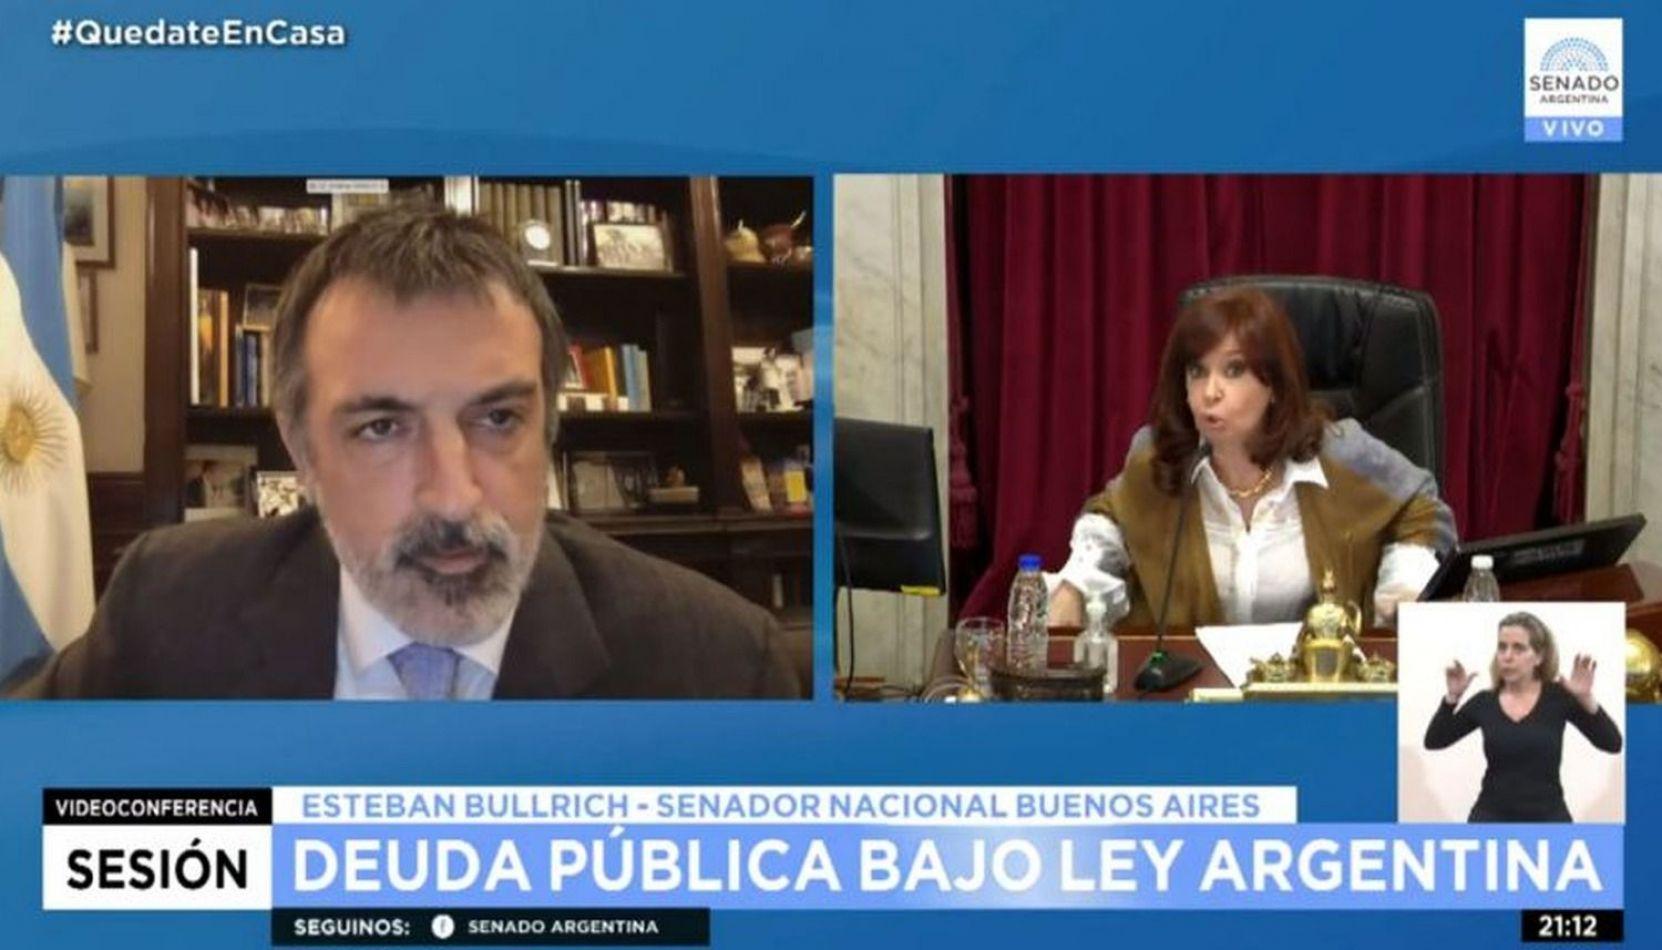 VIDEO Lo hizo otra vez: Cristina Kirchner le cortó el micrófono a un opositor